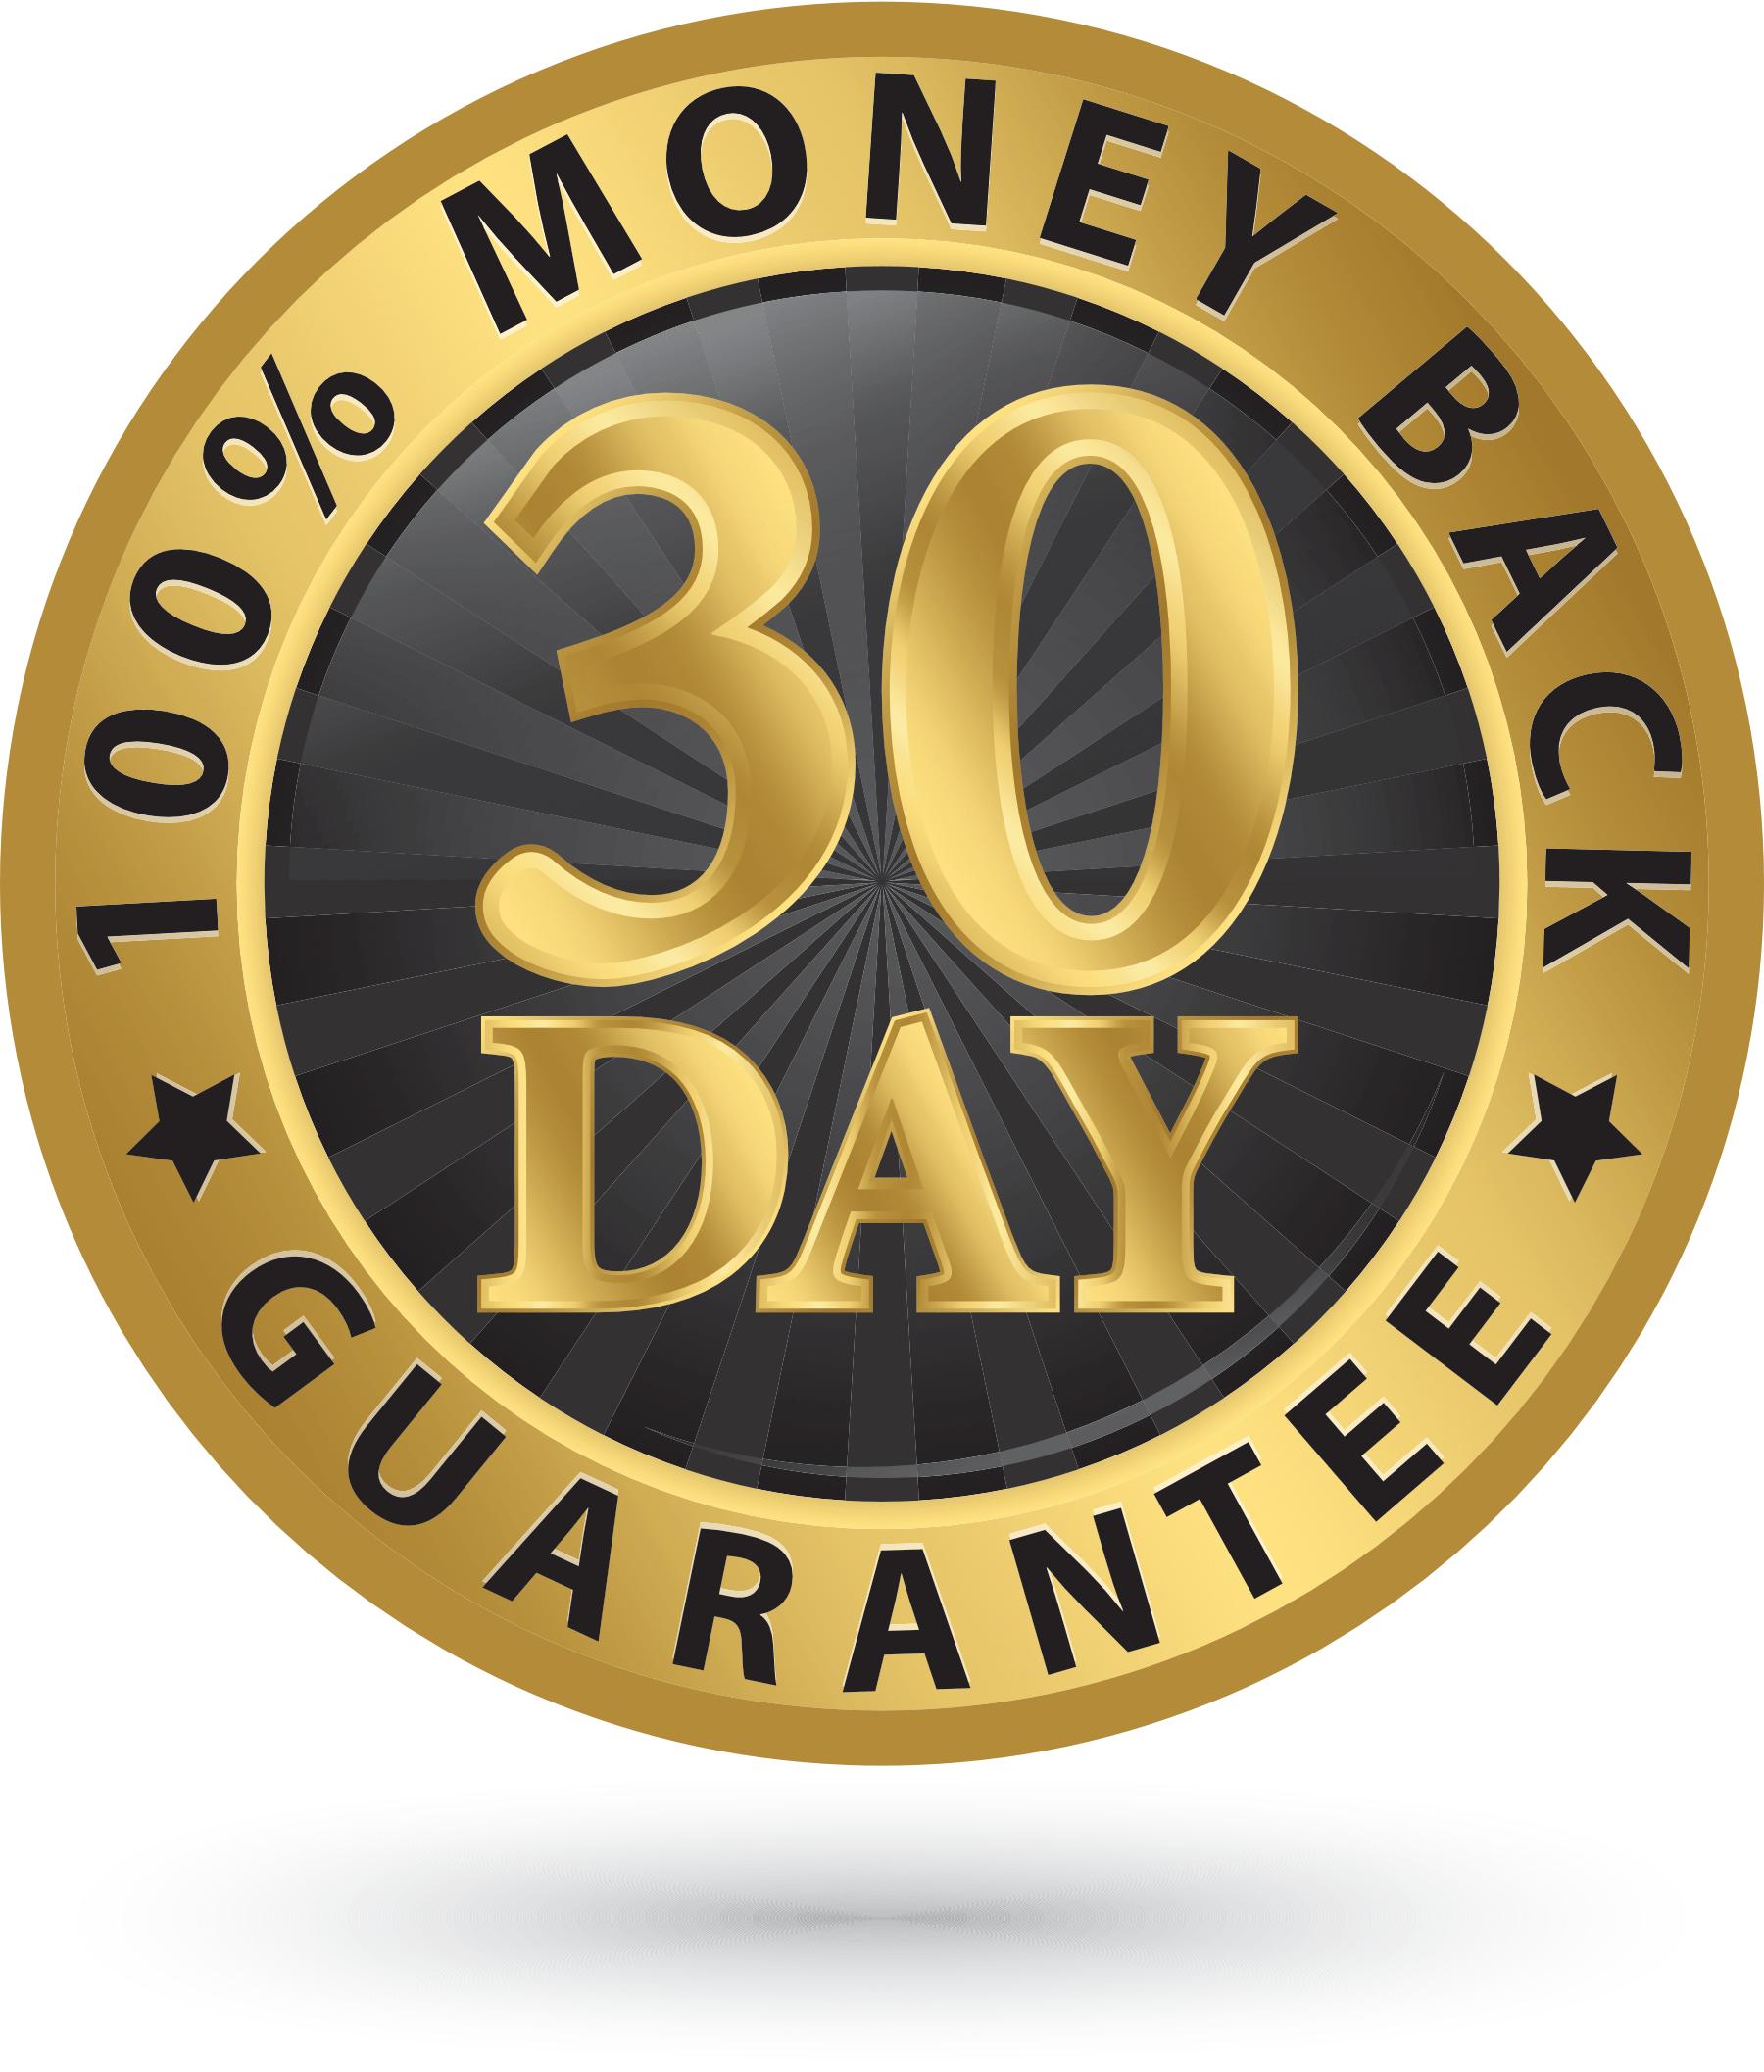 30 Day Monday Back Guarantee